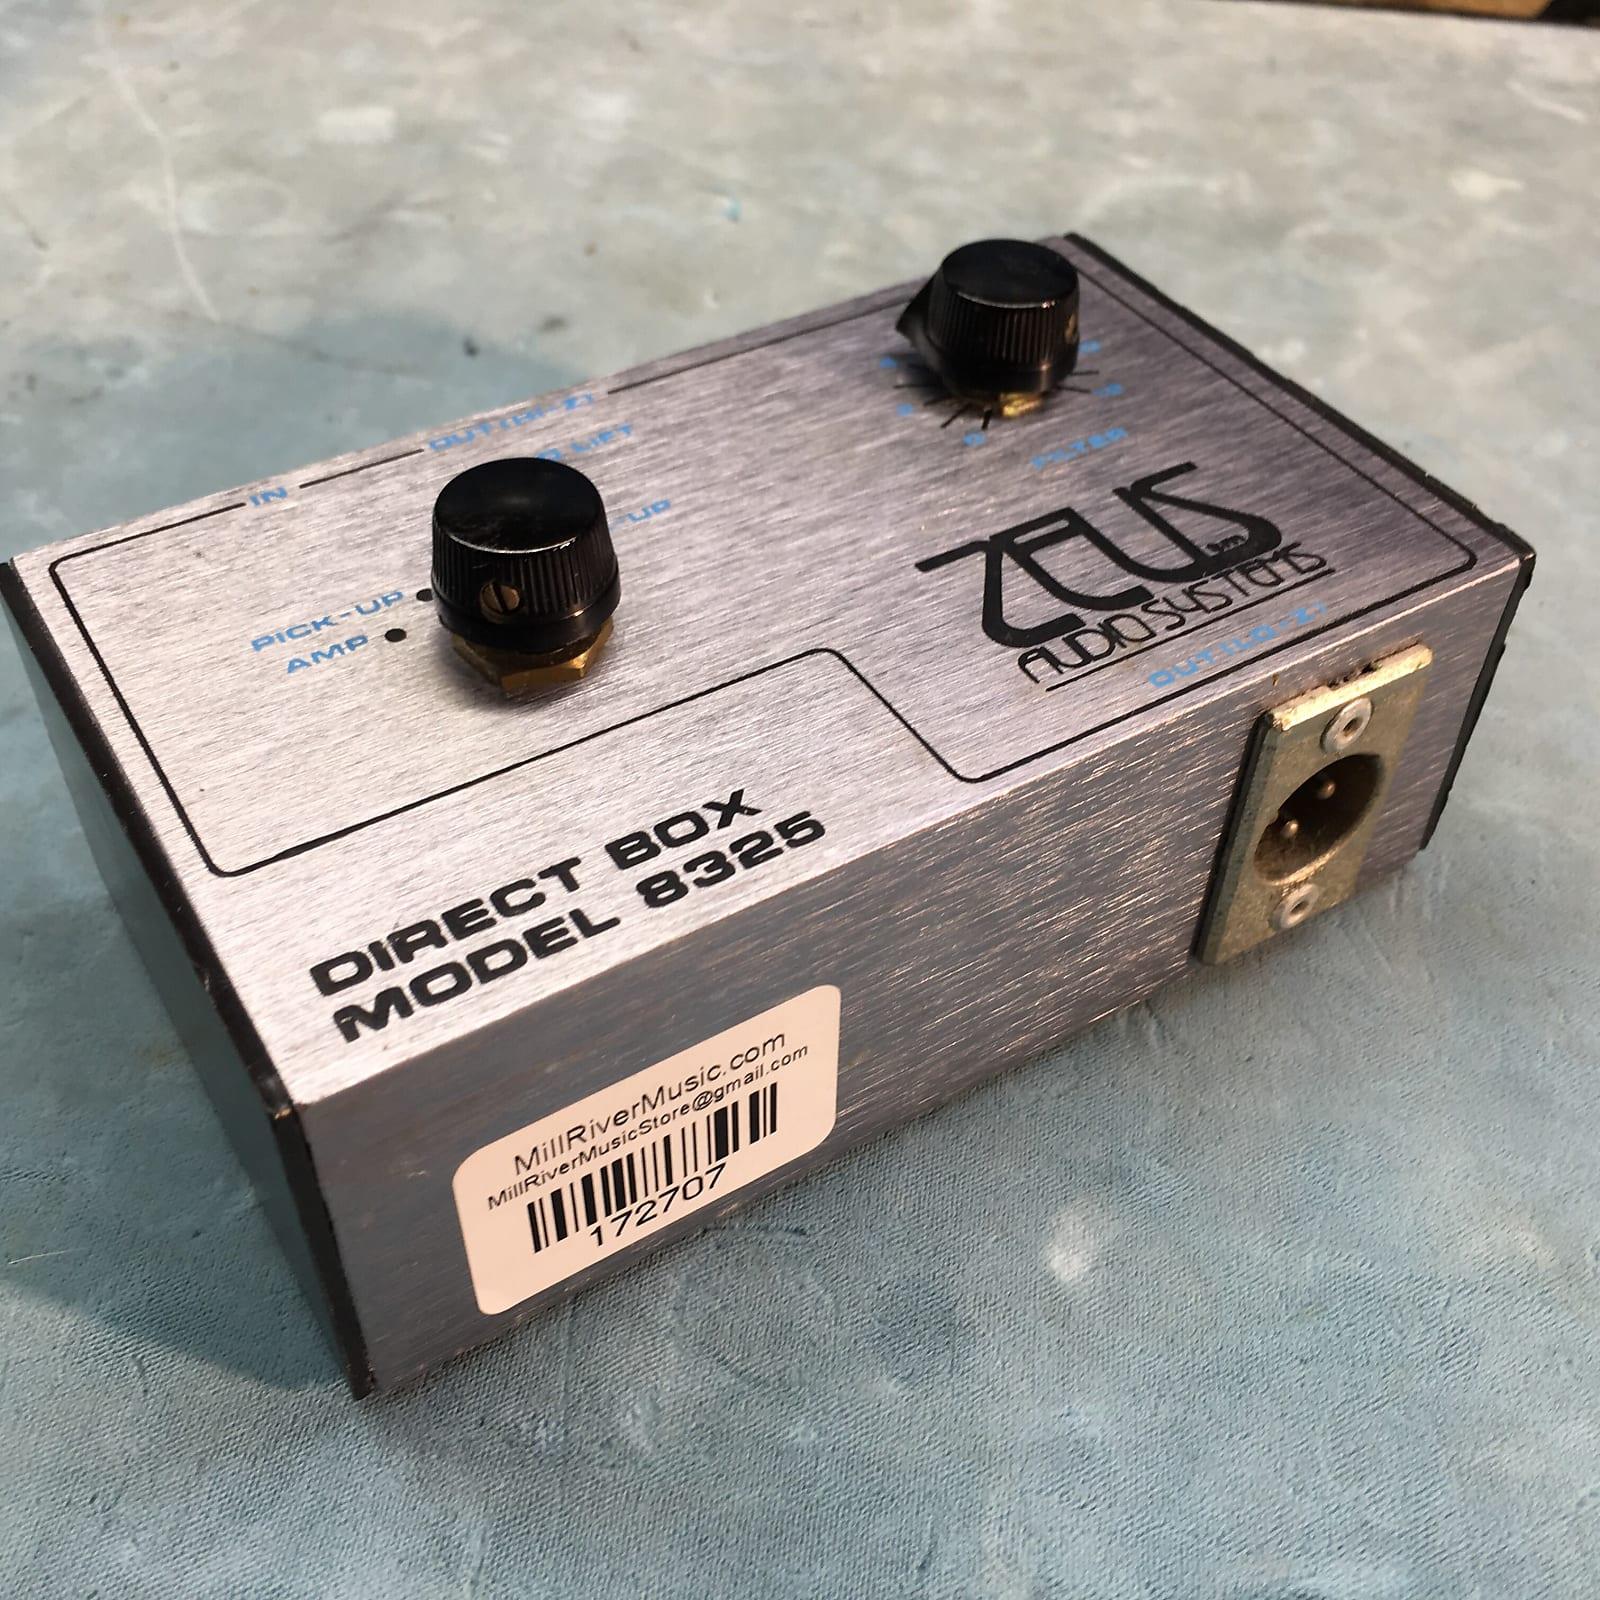 Zeus Audio Systems DI Model 8325 Vintage Direct Box c. 1970s